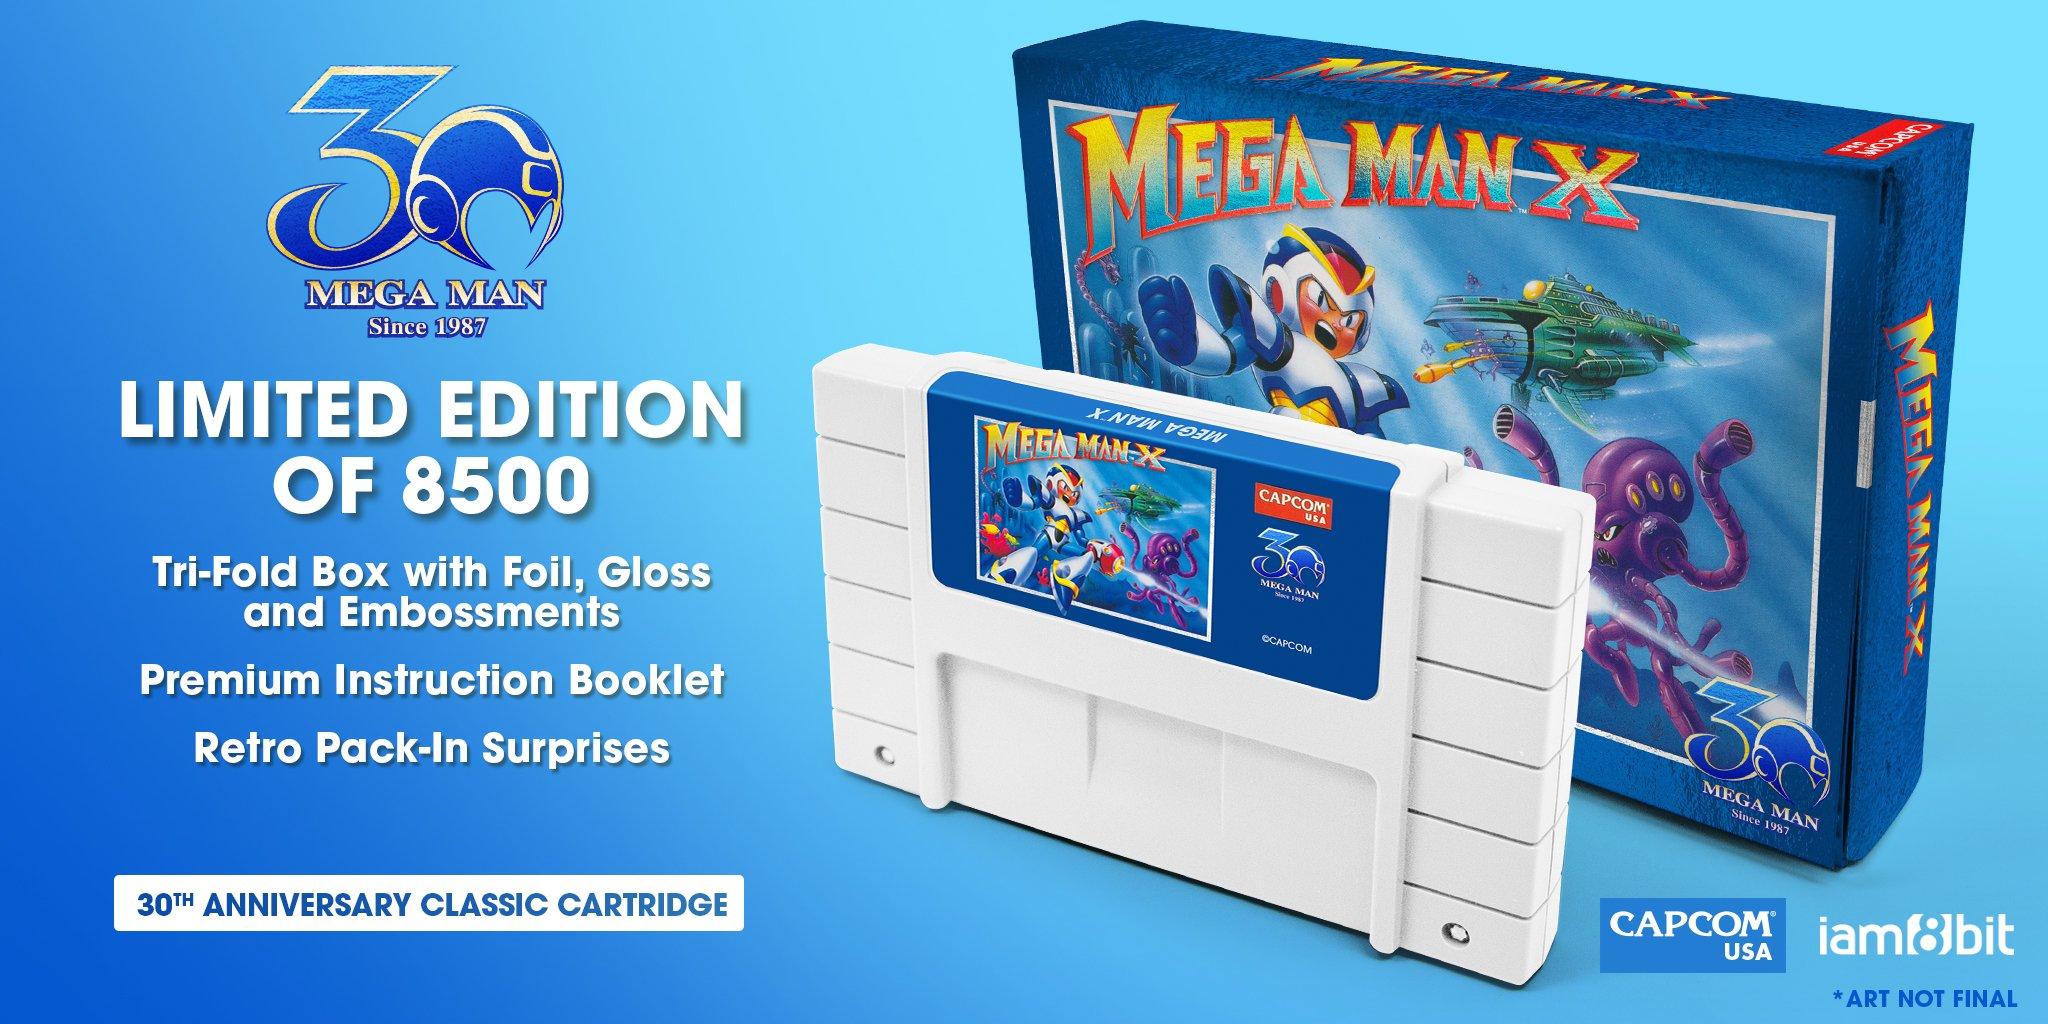 01-Mega Man X-30th Anniversary Classic Cartridge